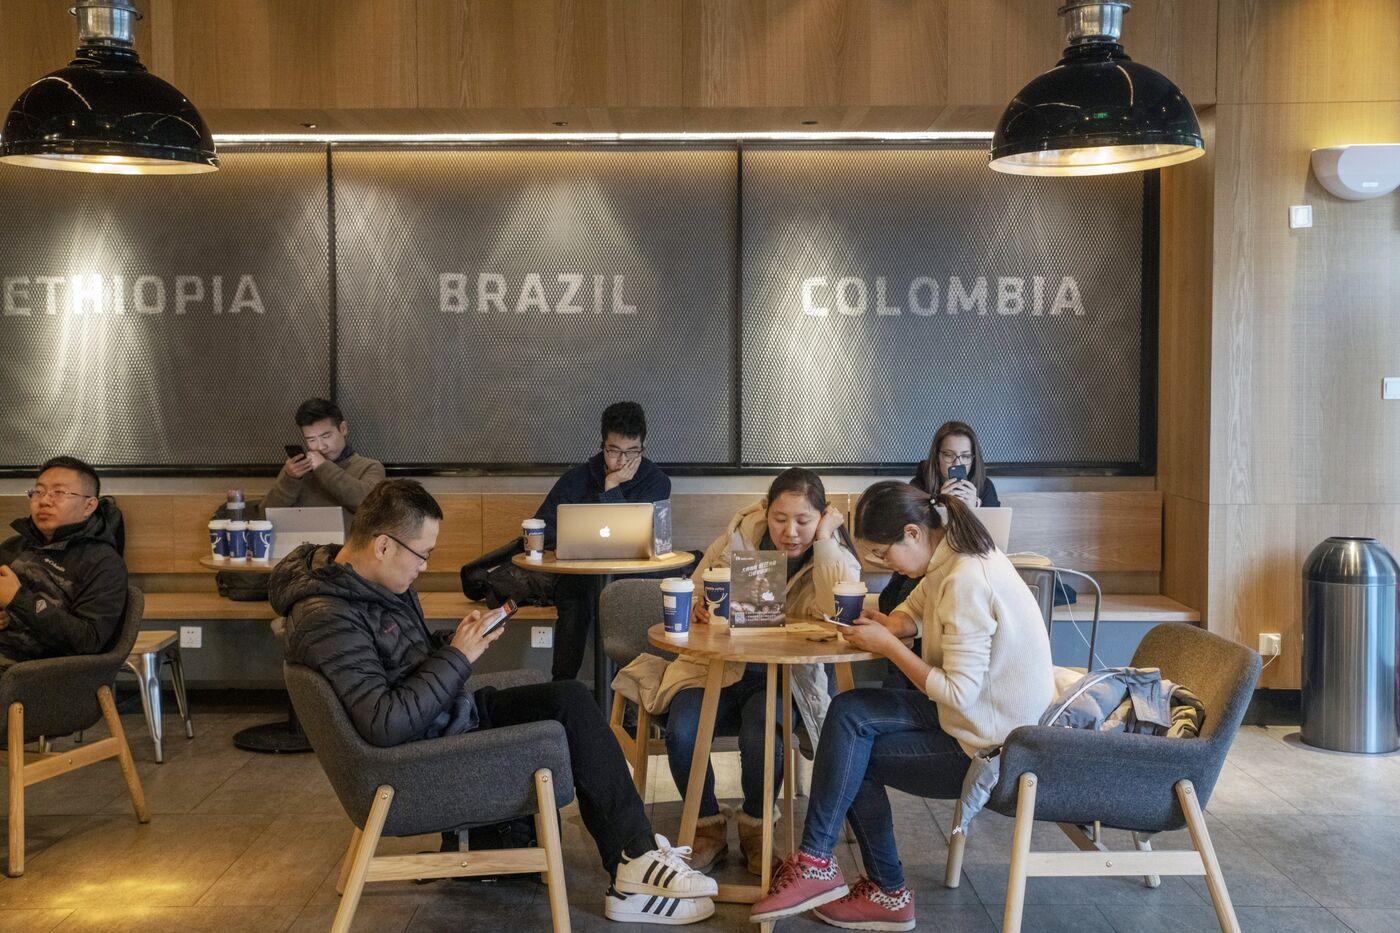 China's Coffee Unicorn Luckin Is Burning Millions to Overtake Starbucks